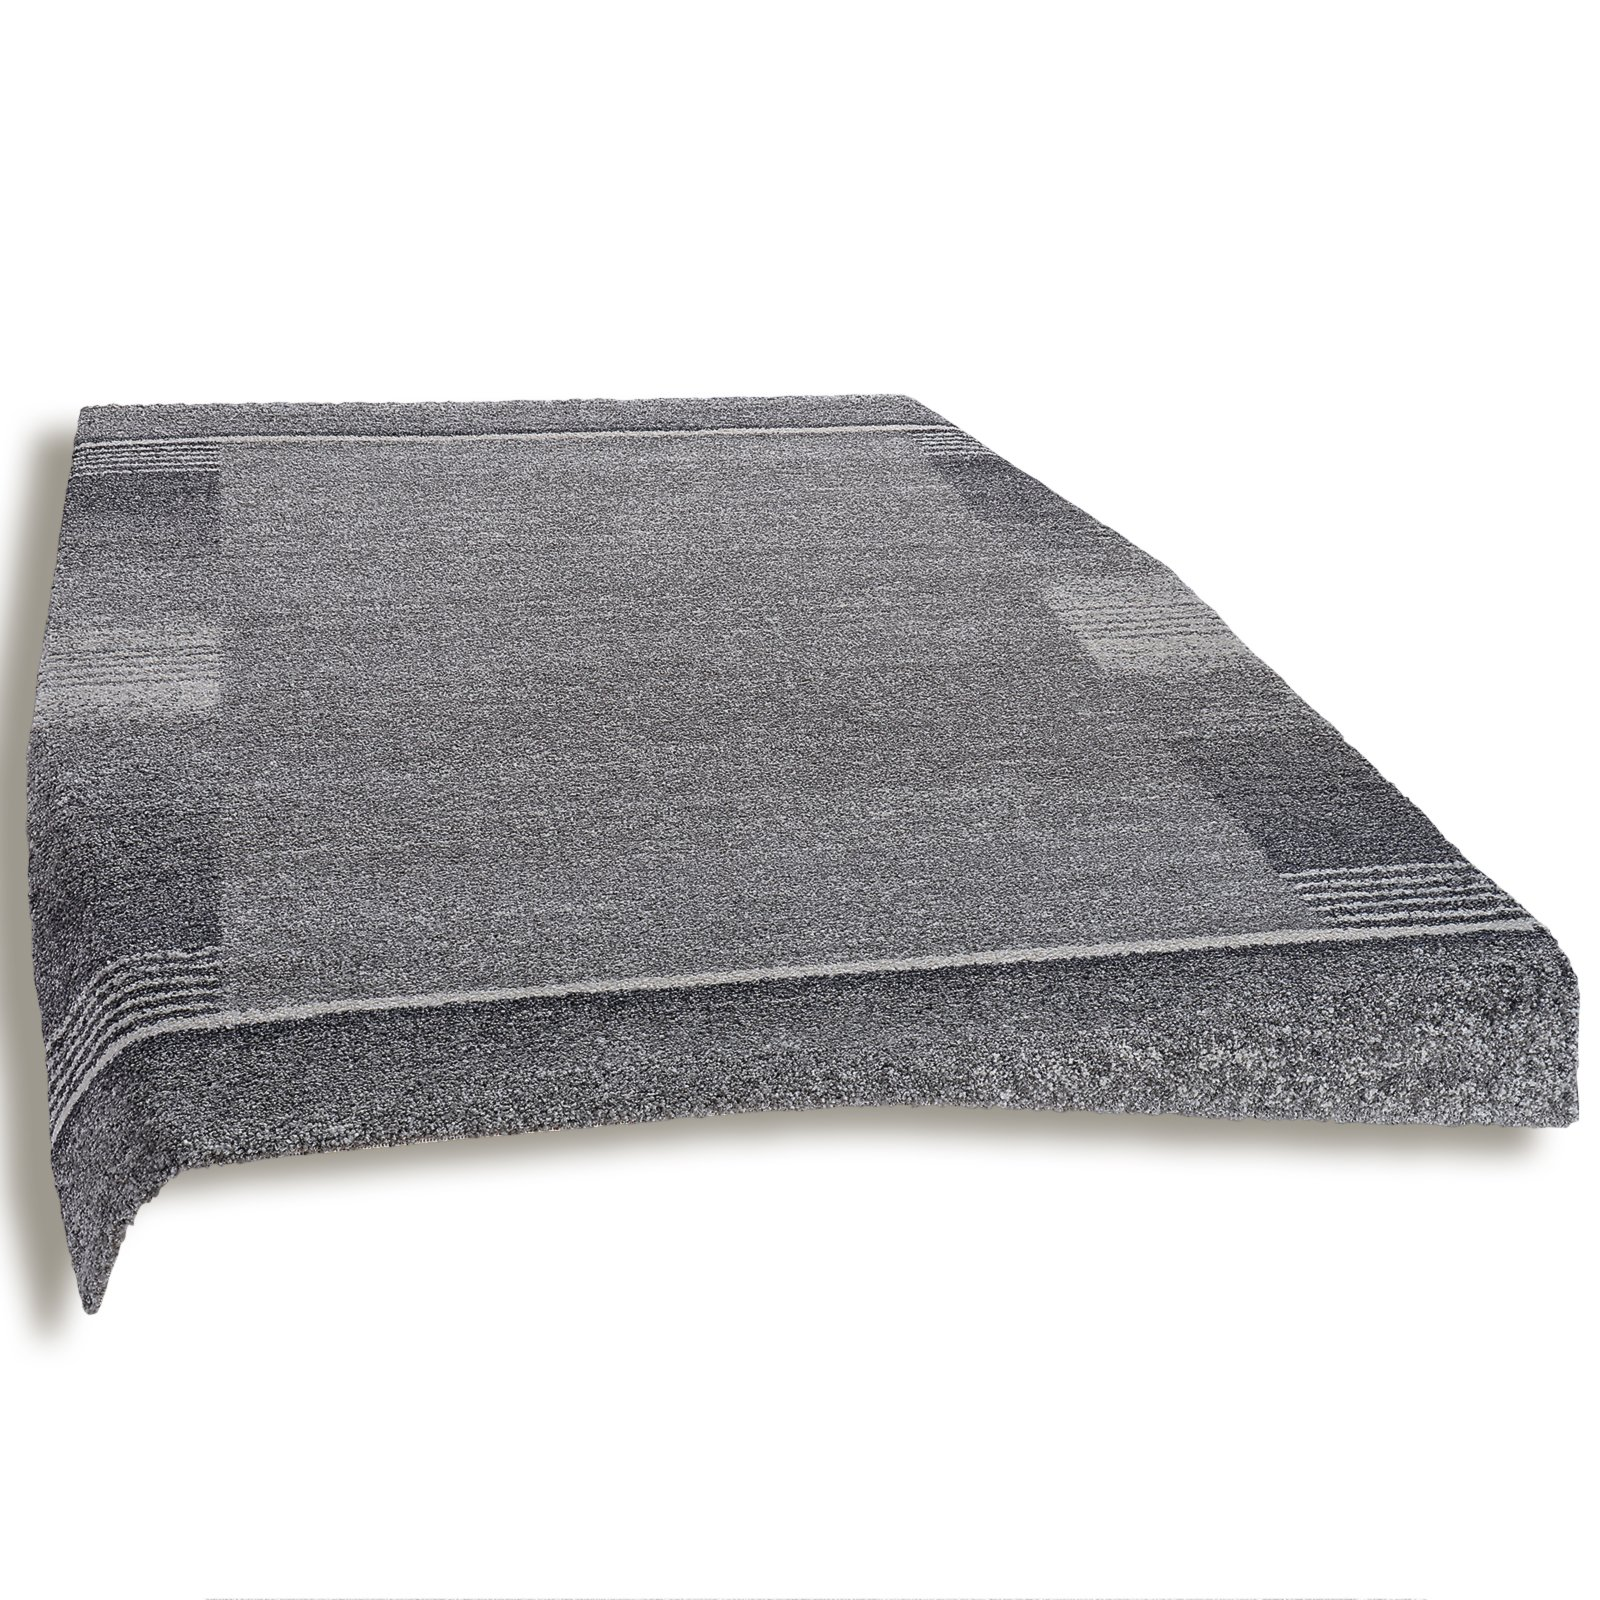 Teppich WIEN  dunkelgrau  80×150 cm  Gemusterte